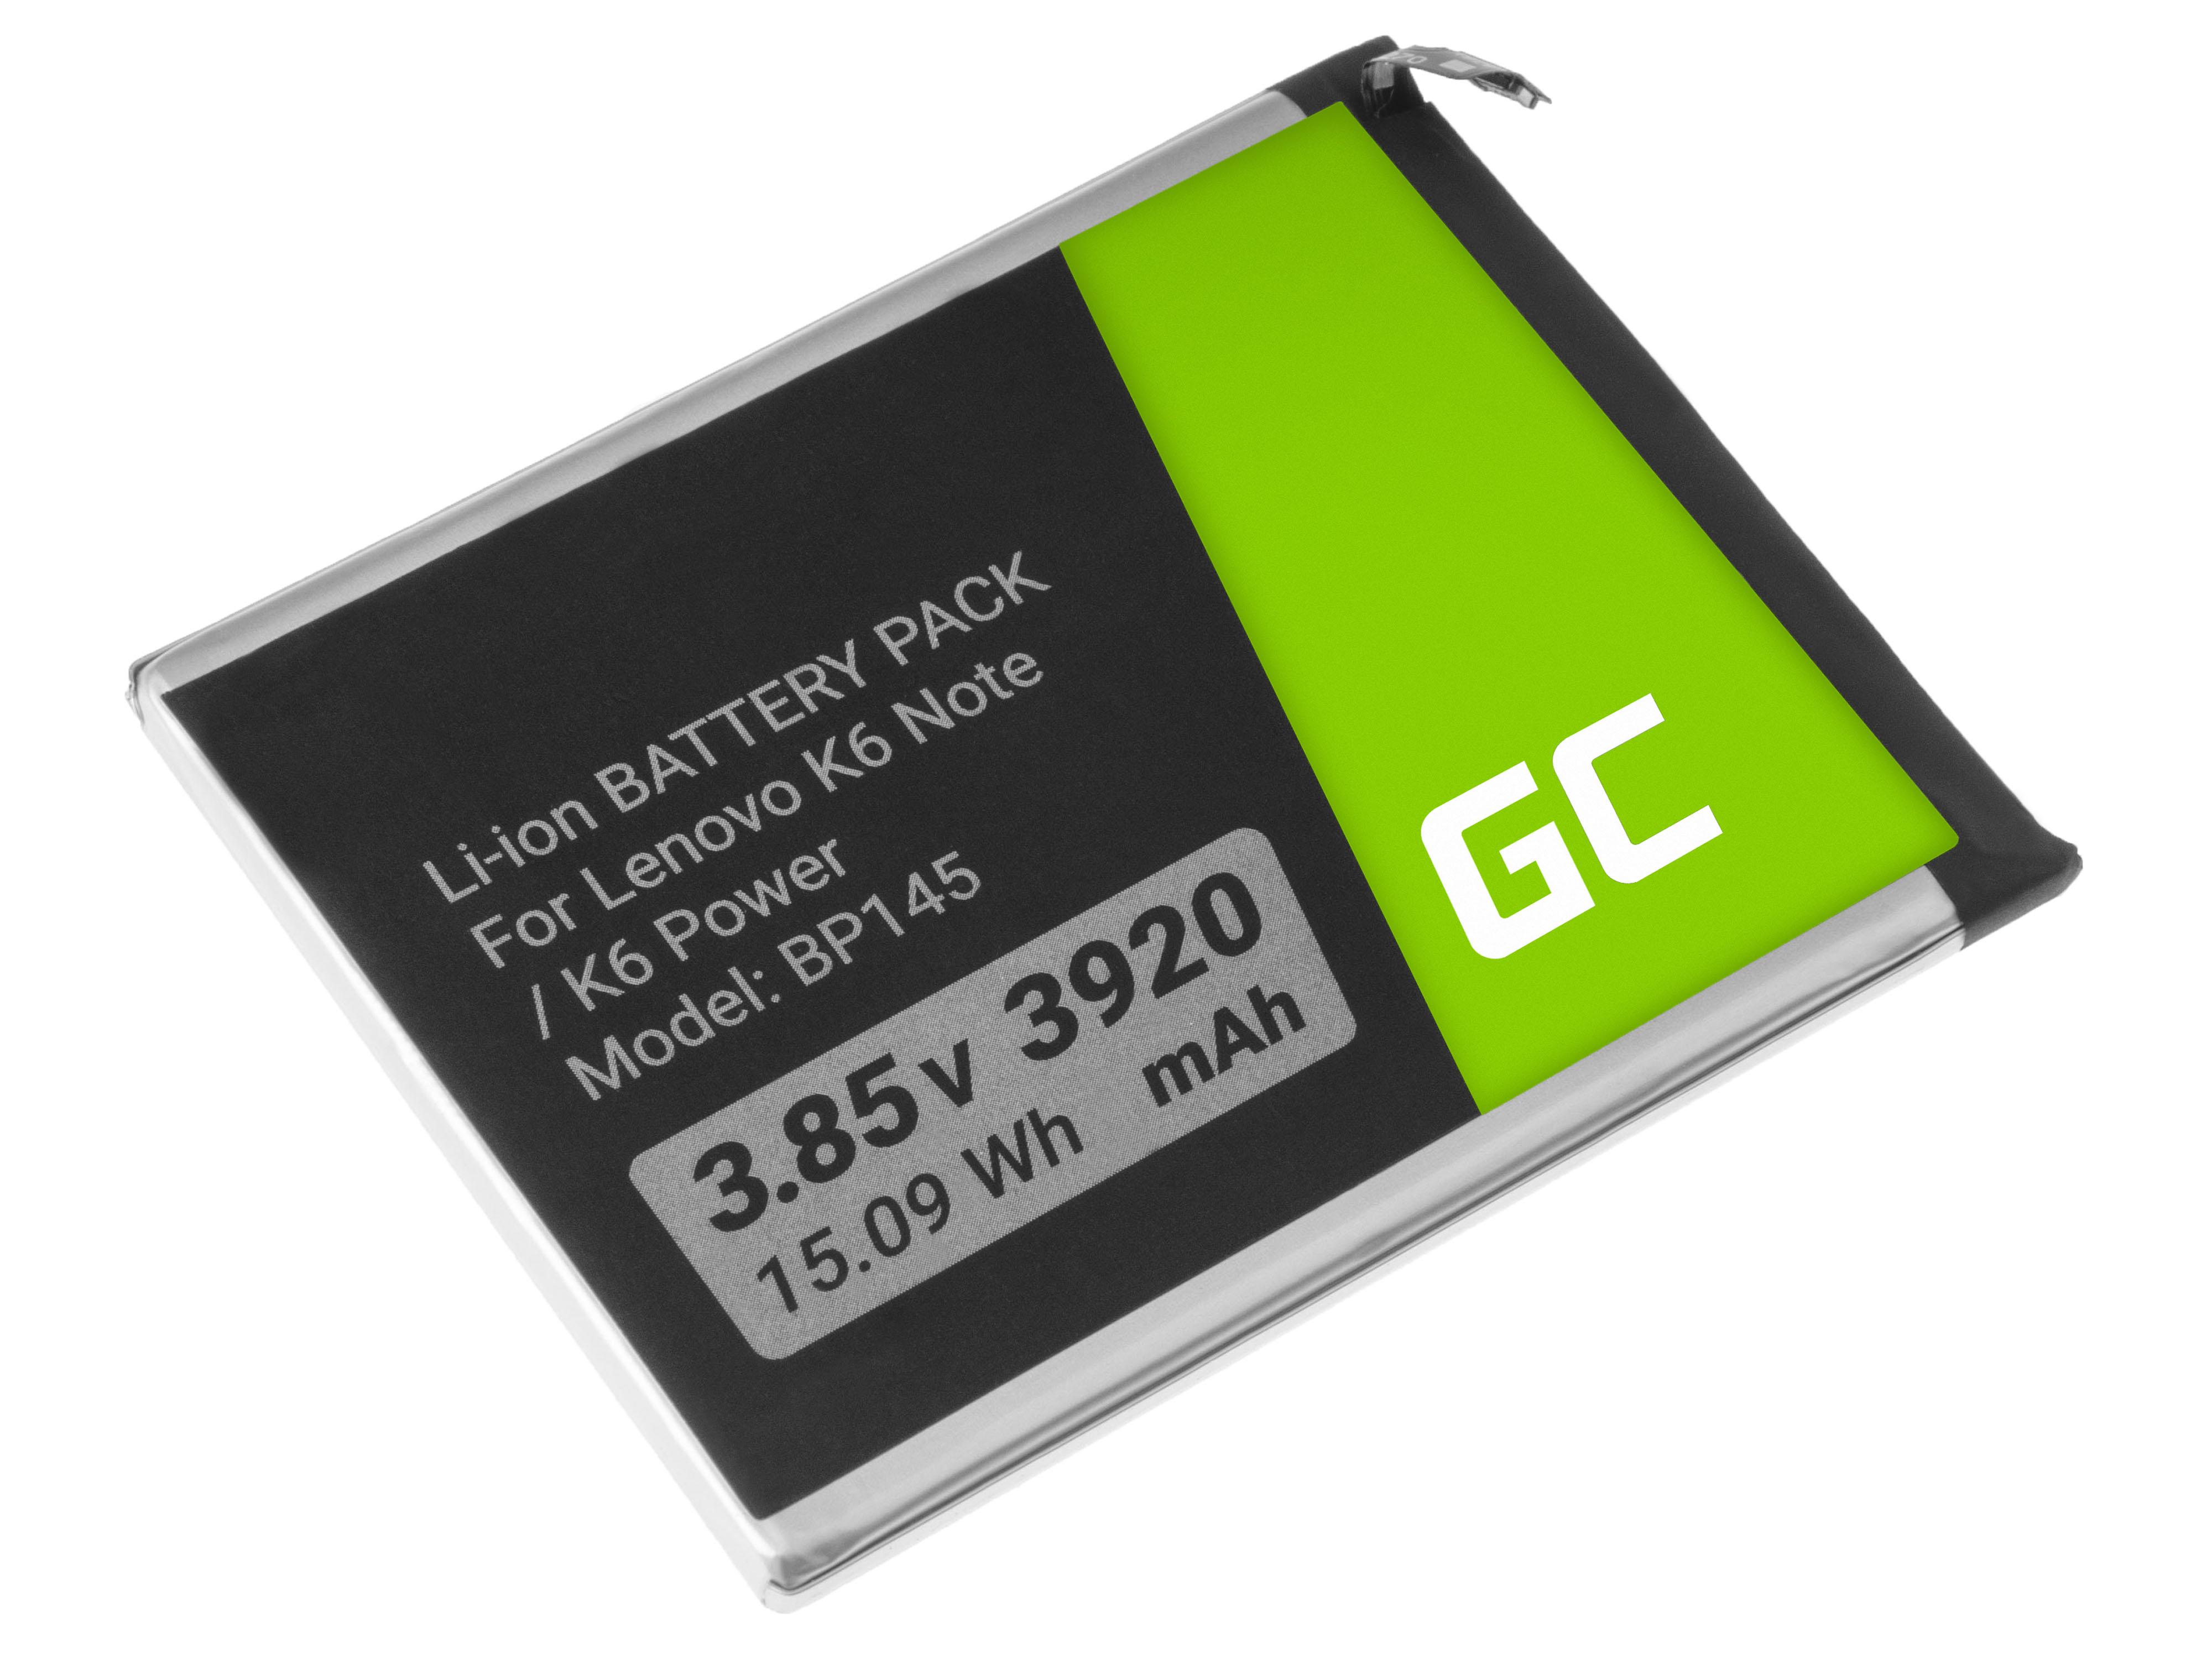 Green Cell BP145 Baterie Lenovo BL270 pro Lenovo K6 Note / K6 Power 3920mAh Li-Ion - neoriginální